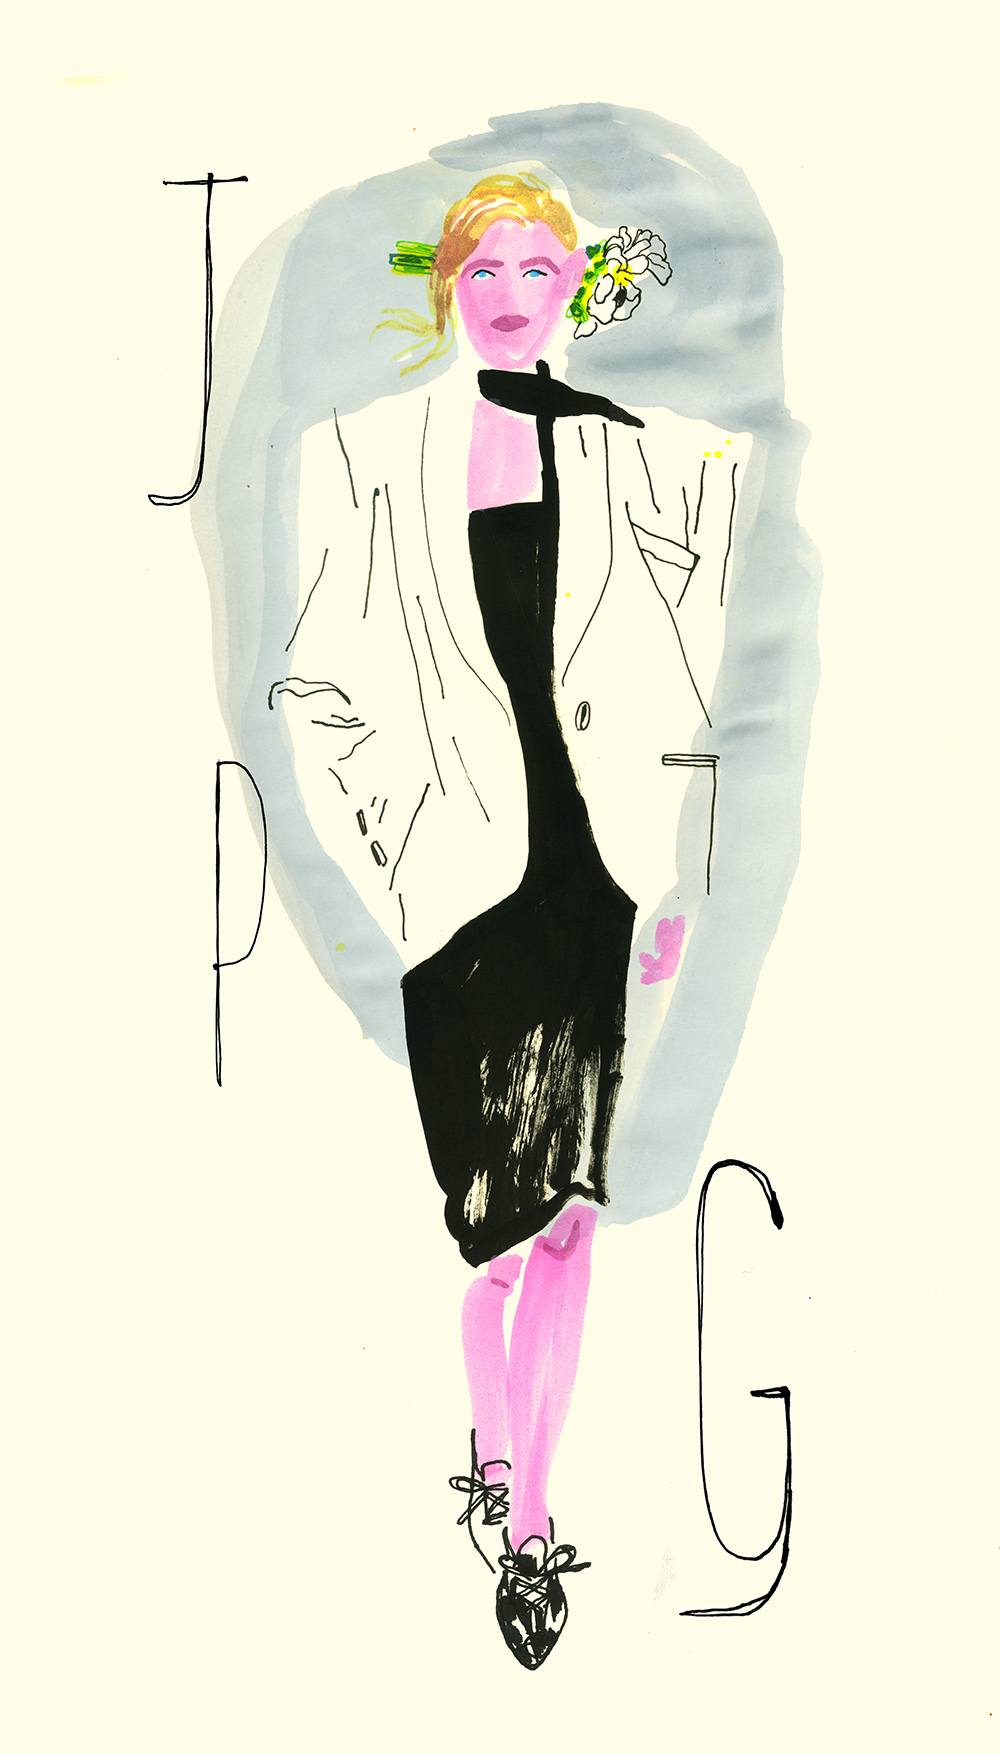 Jean Paul Gaultier S/S 15 Couture